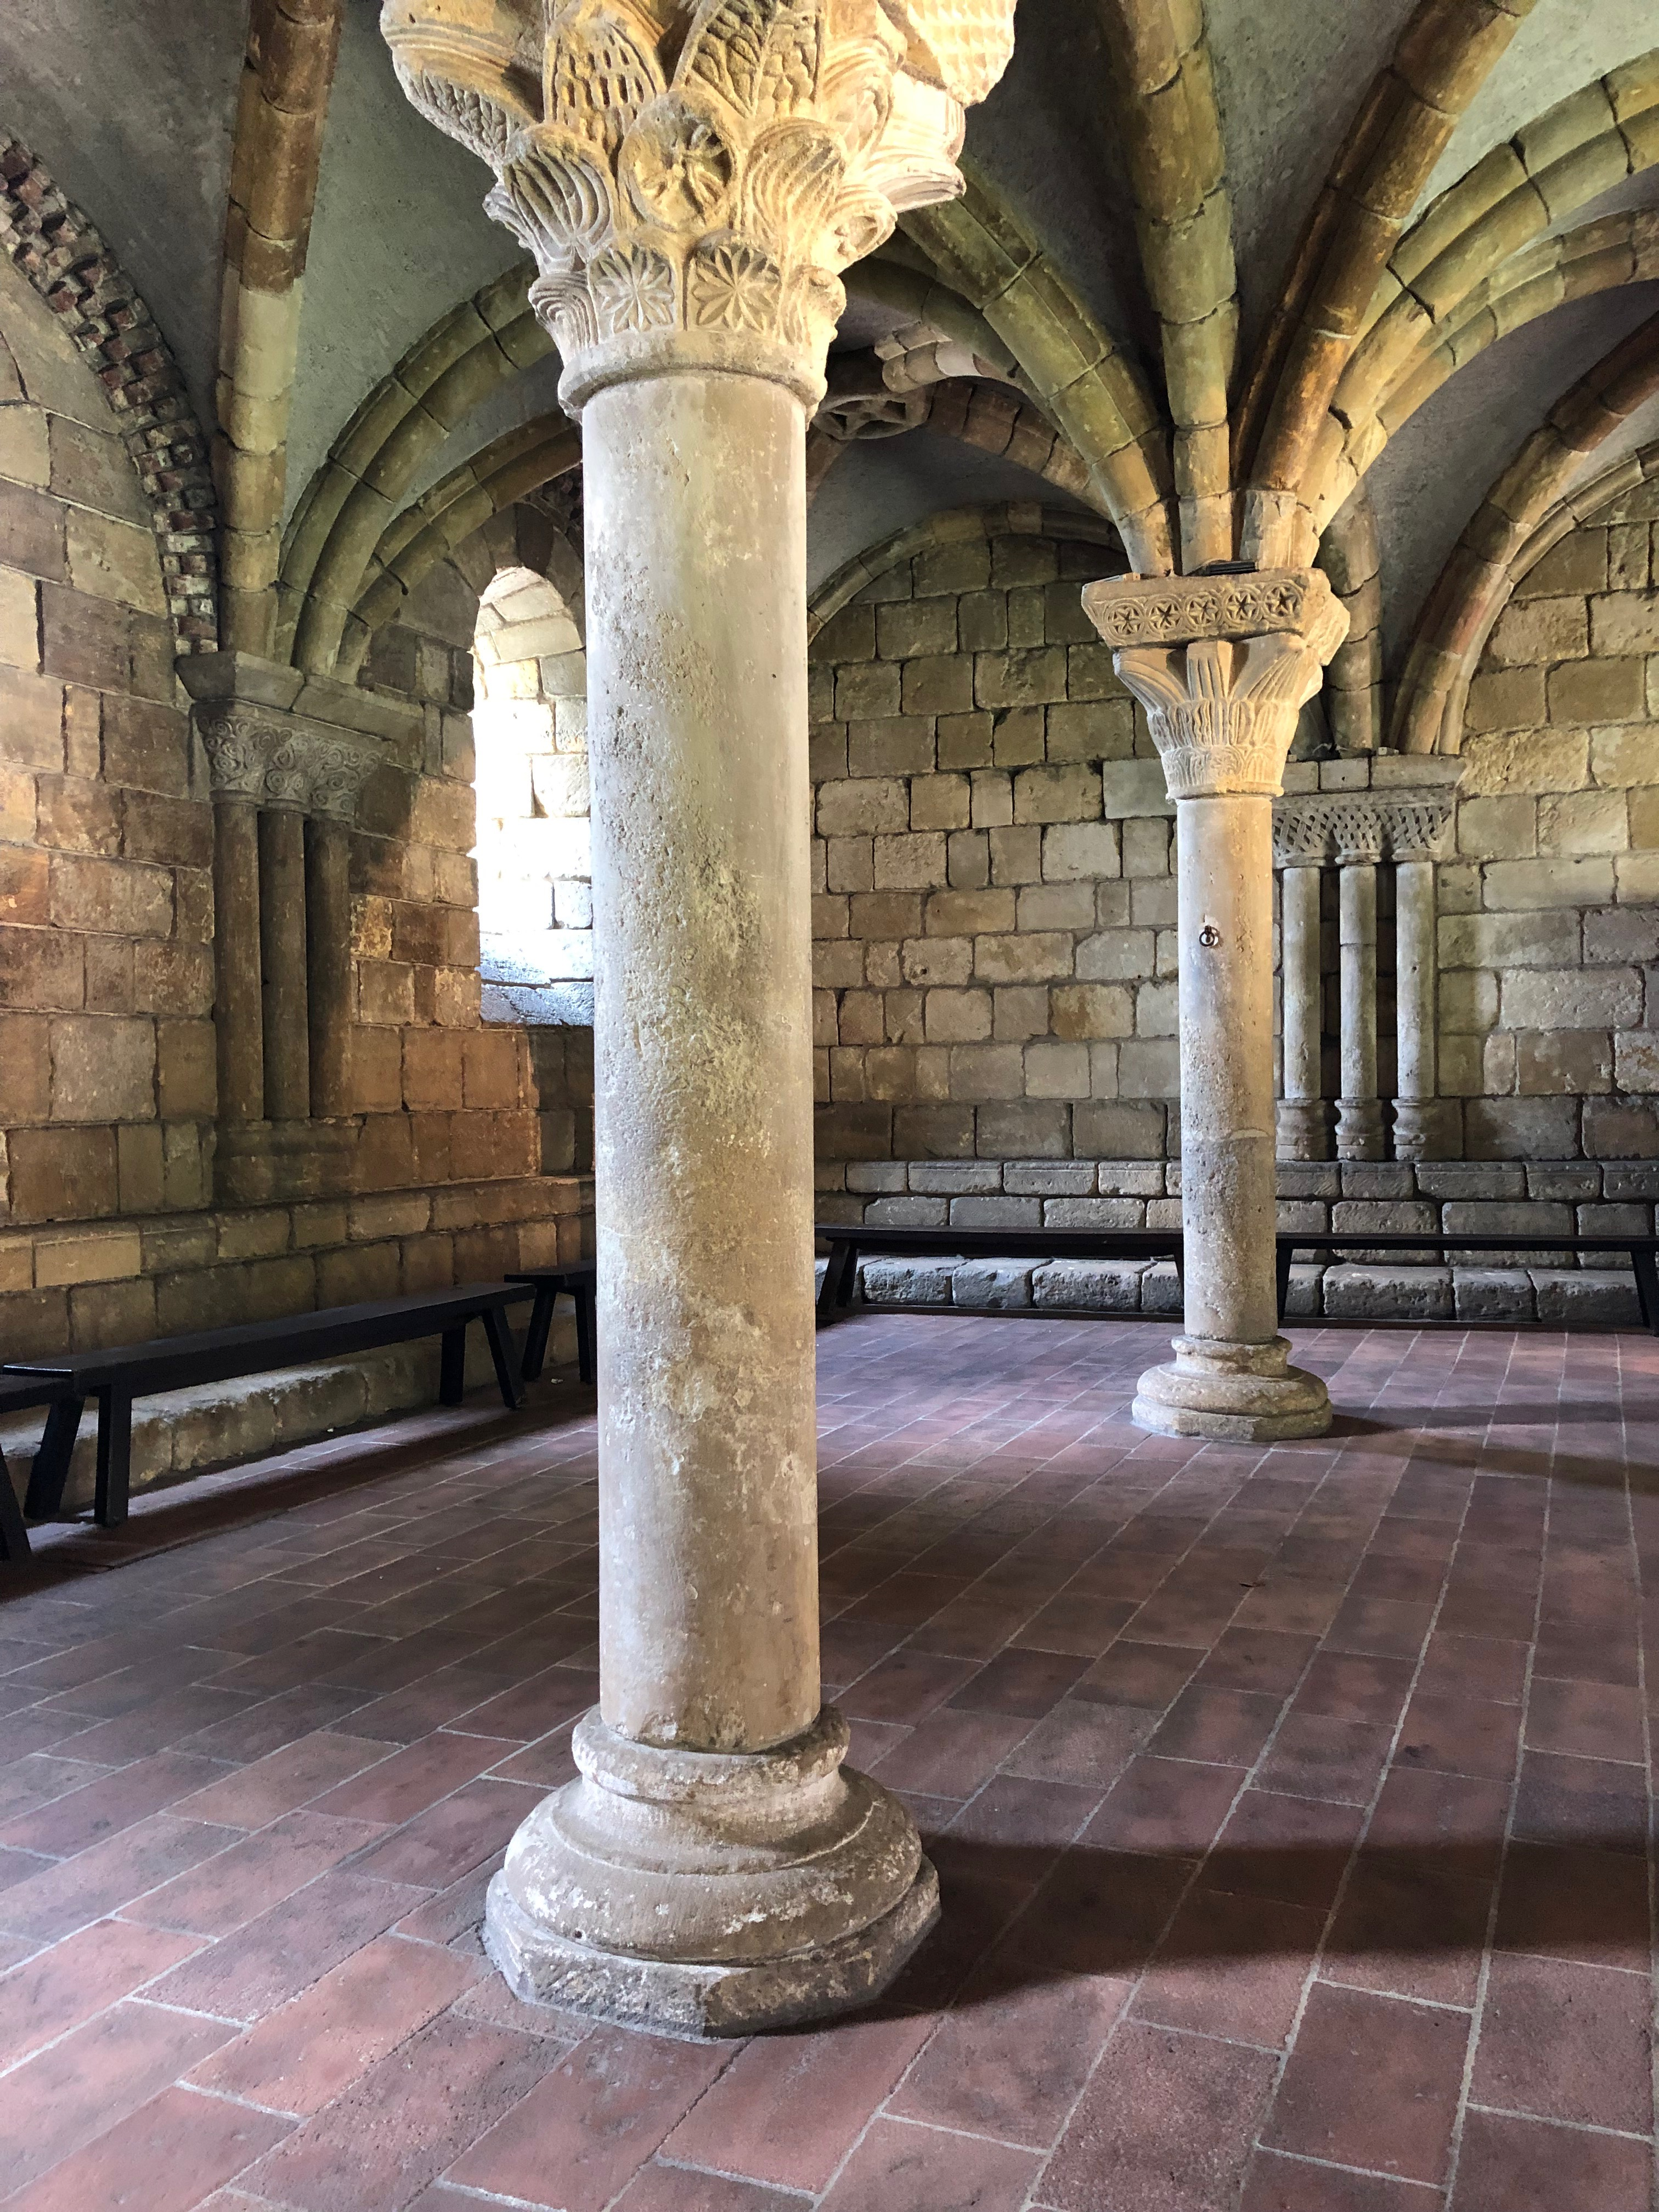 072619-Benedictine-chapel-Cloisters-NYC